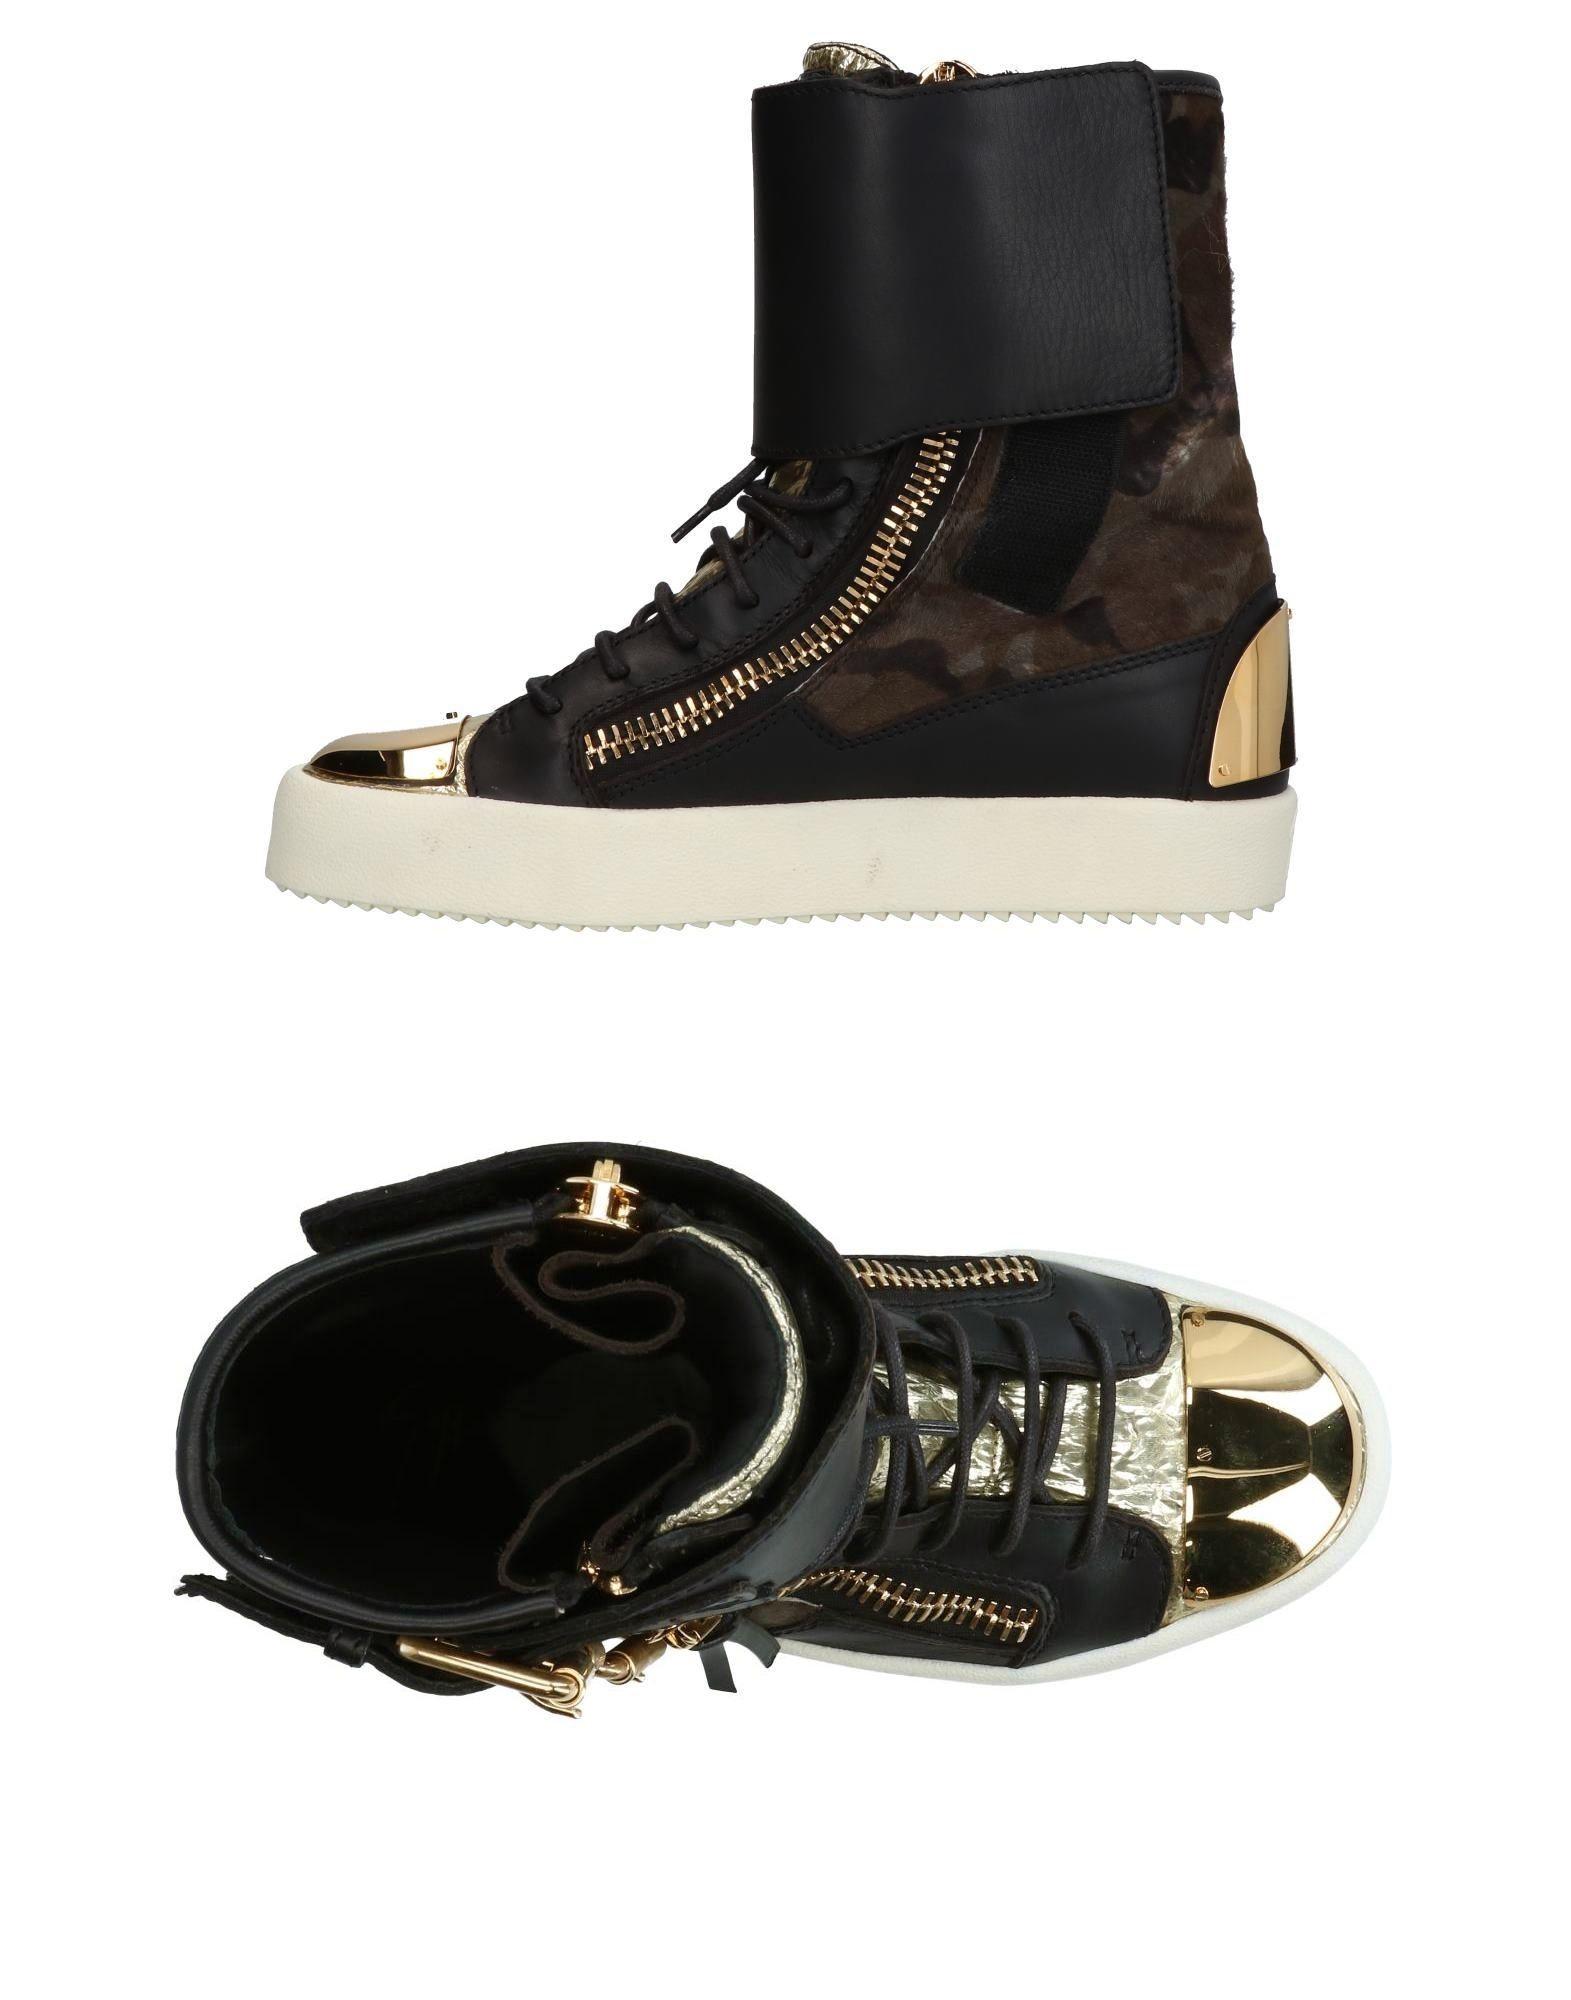 Giuseppe Zanotti Sneakers Herren  11311532VN Gute Qualität beliebte Schuhe